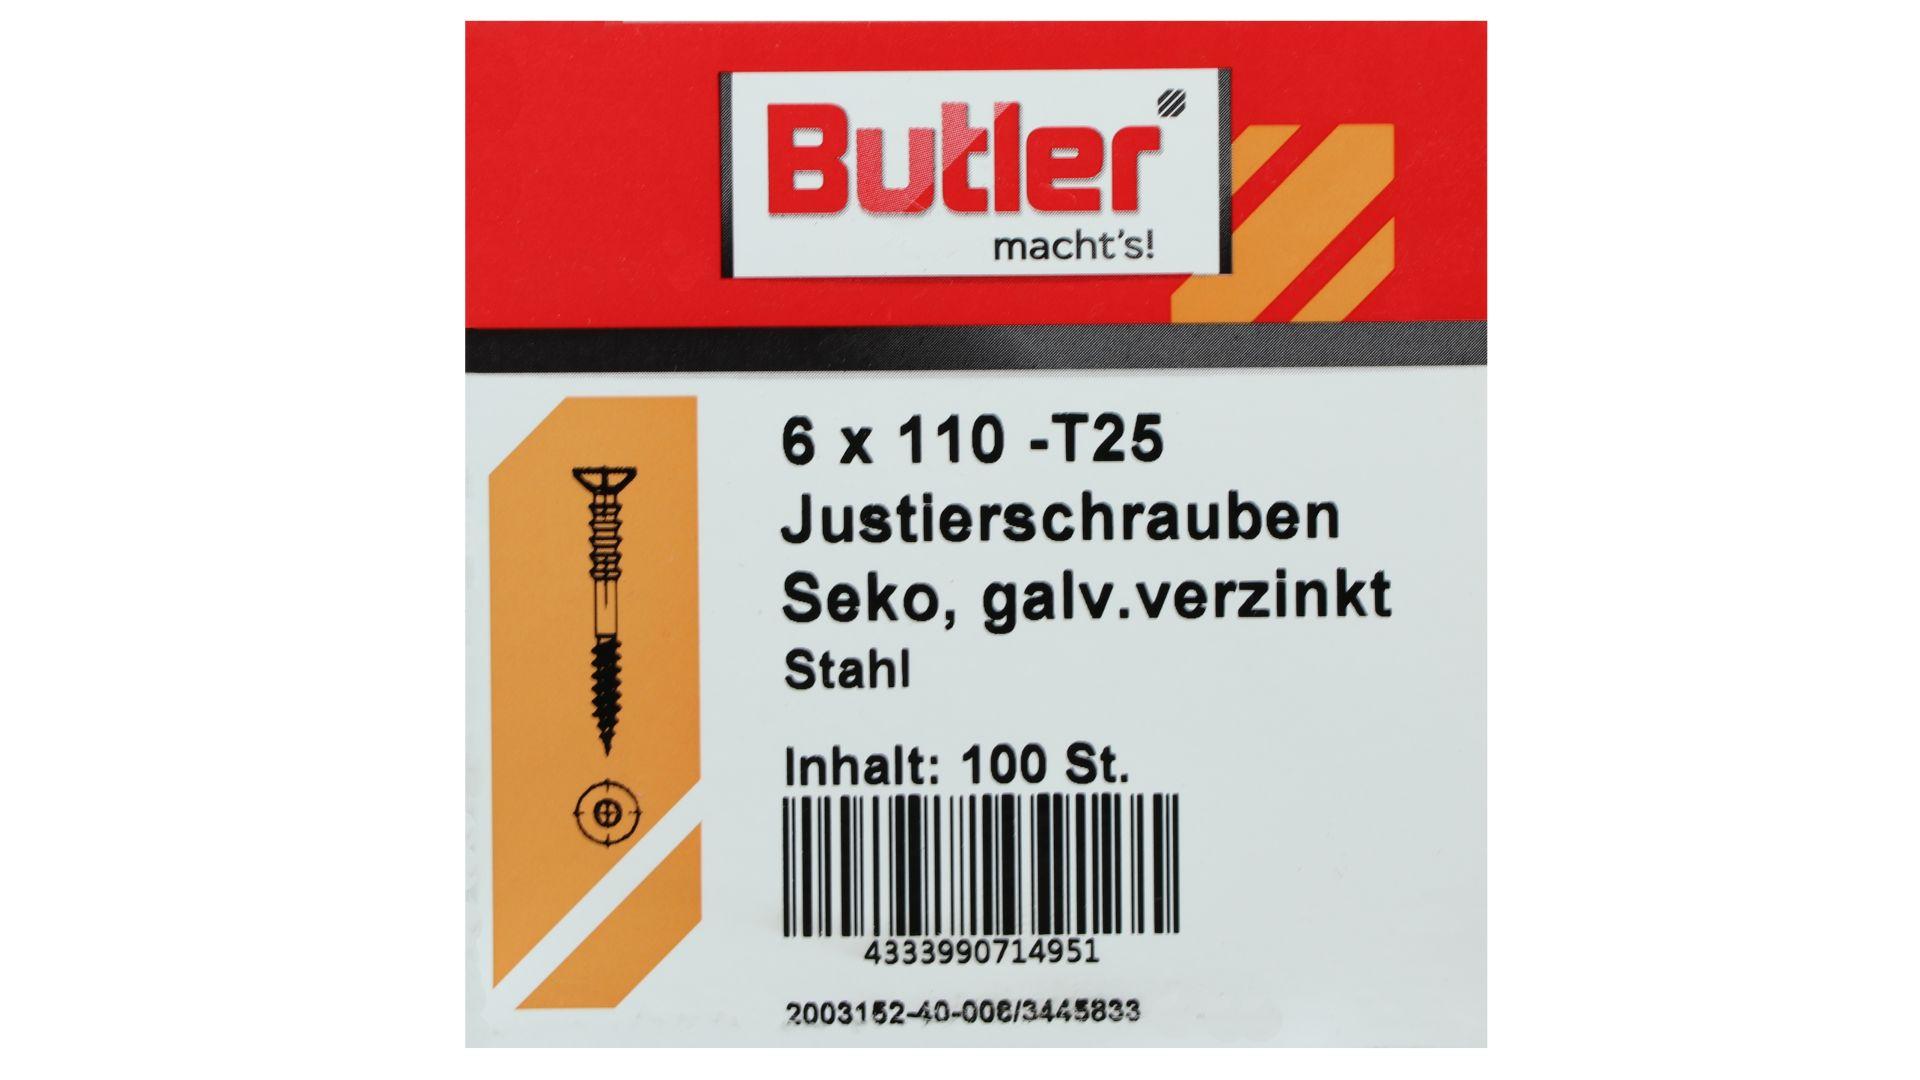 Butler macht's! Justierschraube, Stahl, Senkkopf, galvanisch verzinkt, T25, 6 x 110 mm, 100 Stück